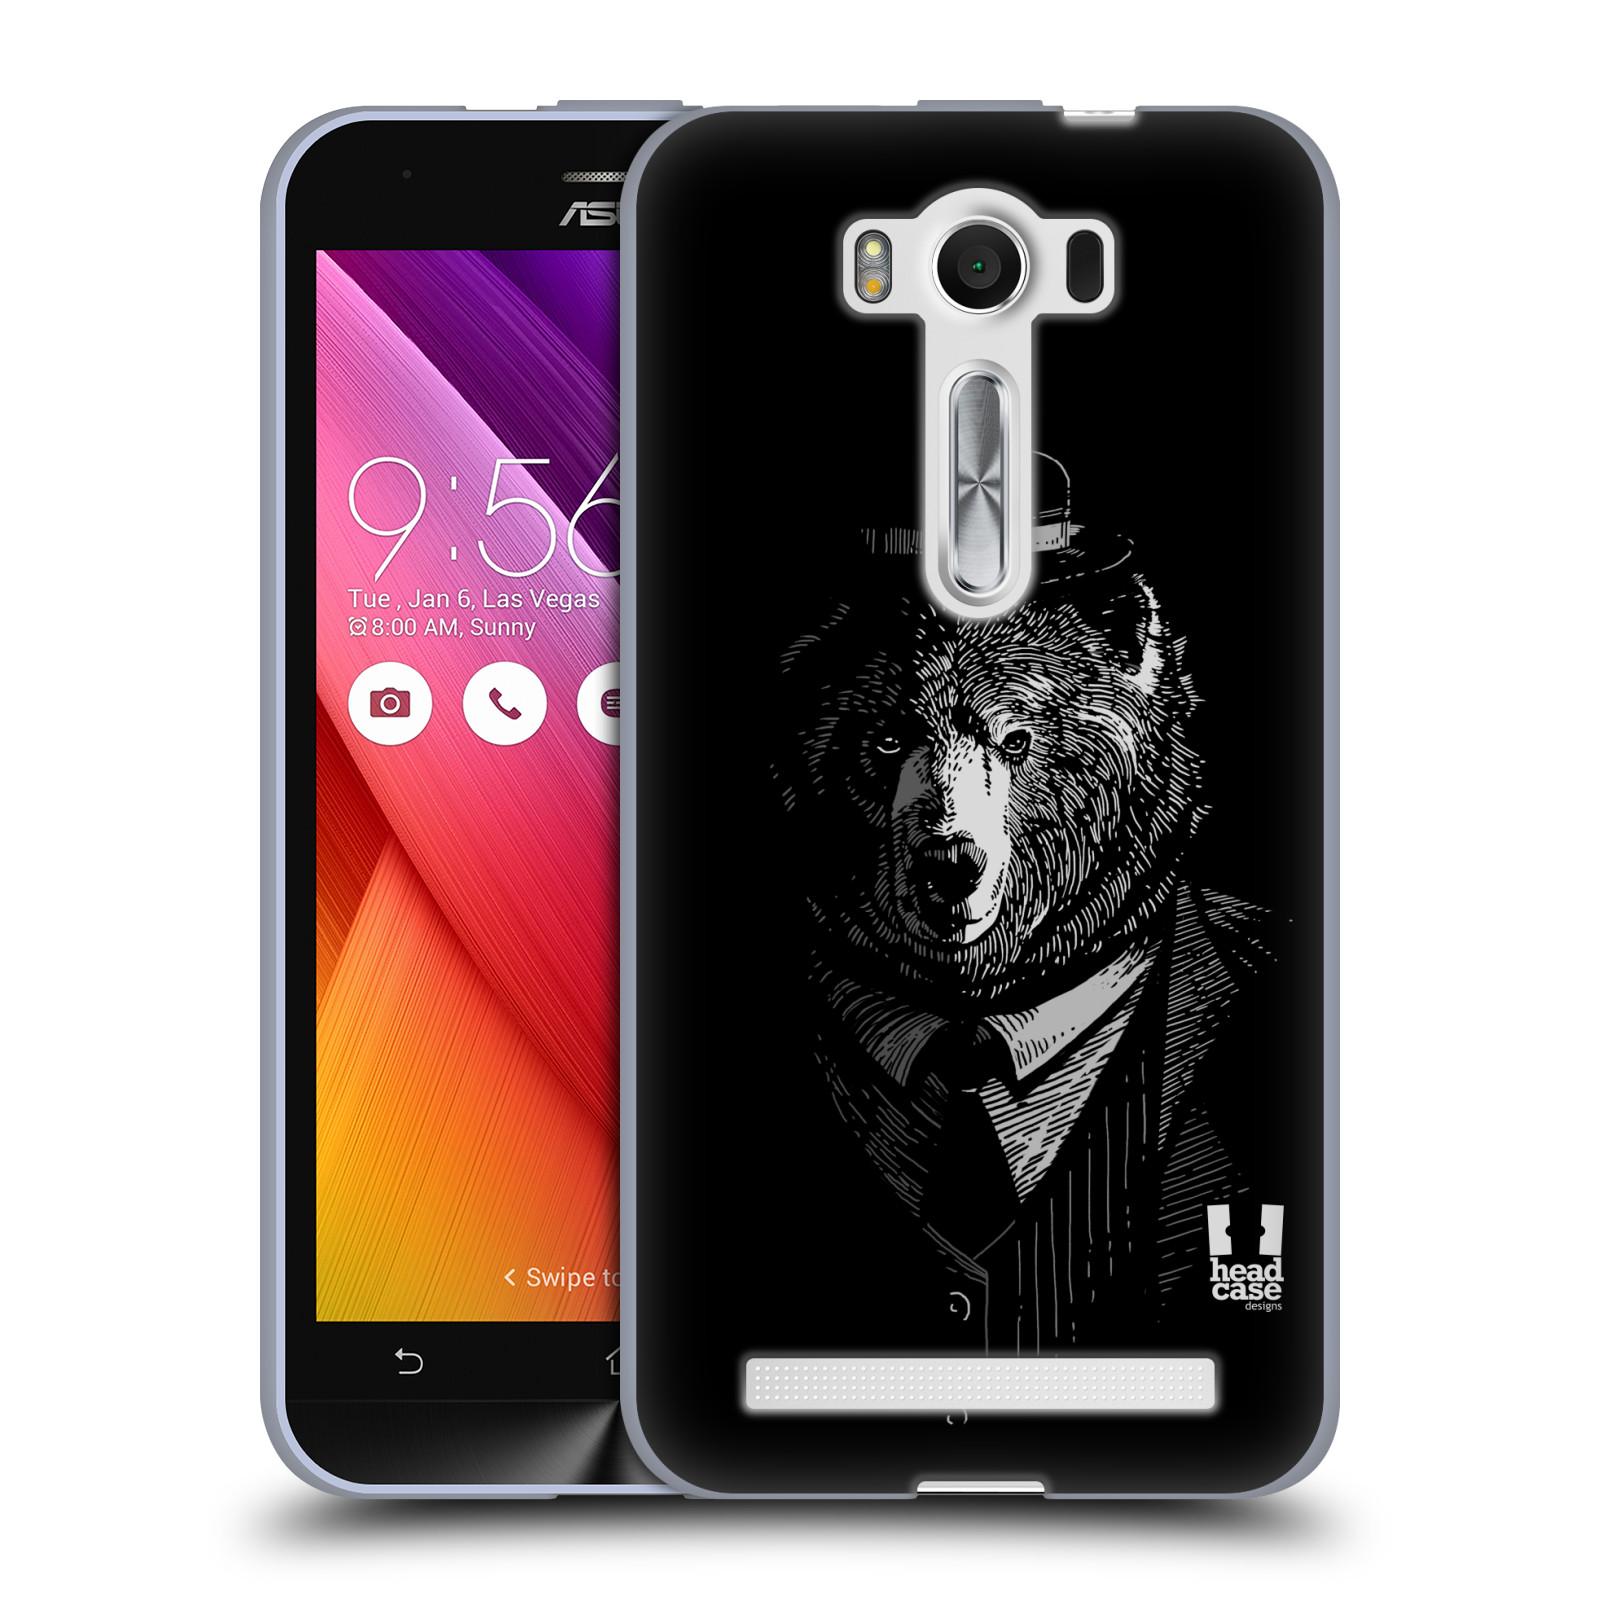 "HEAD CASE silikonový obal na mobil Asus Zenfone 2 LASER (ZE500KL s 5"" displejem) vzor Zvíře v obleku medvěd"